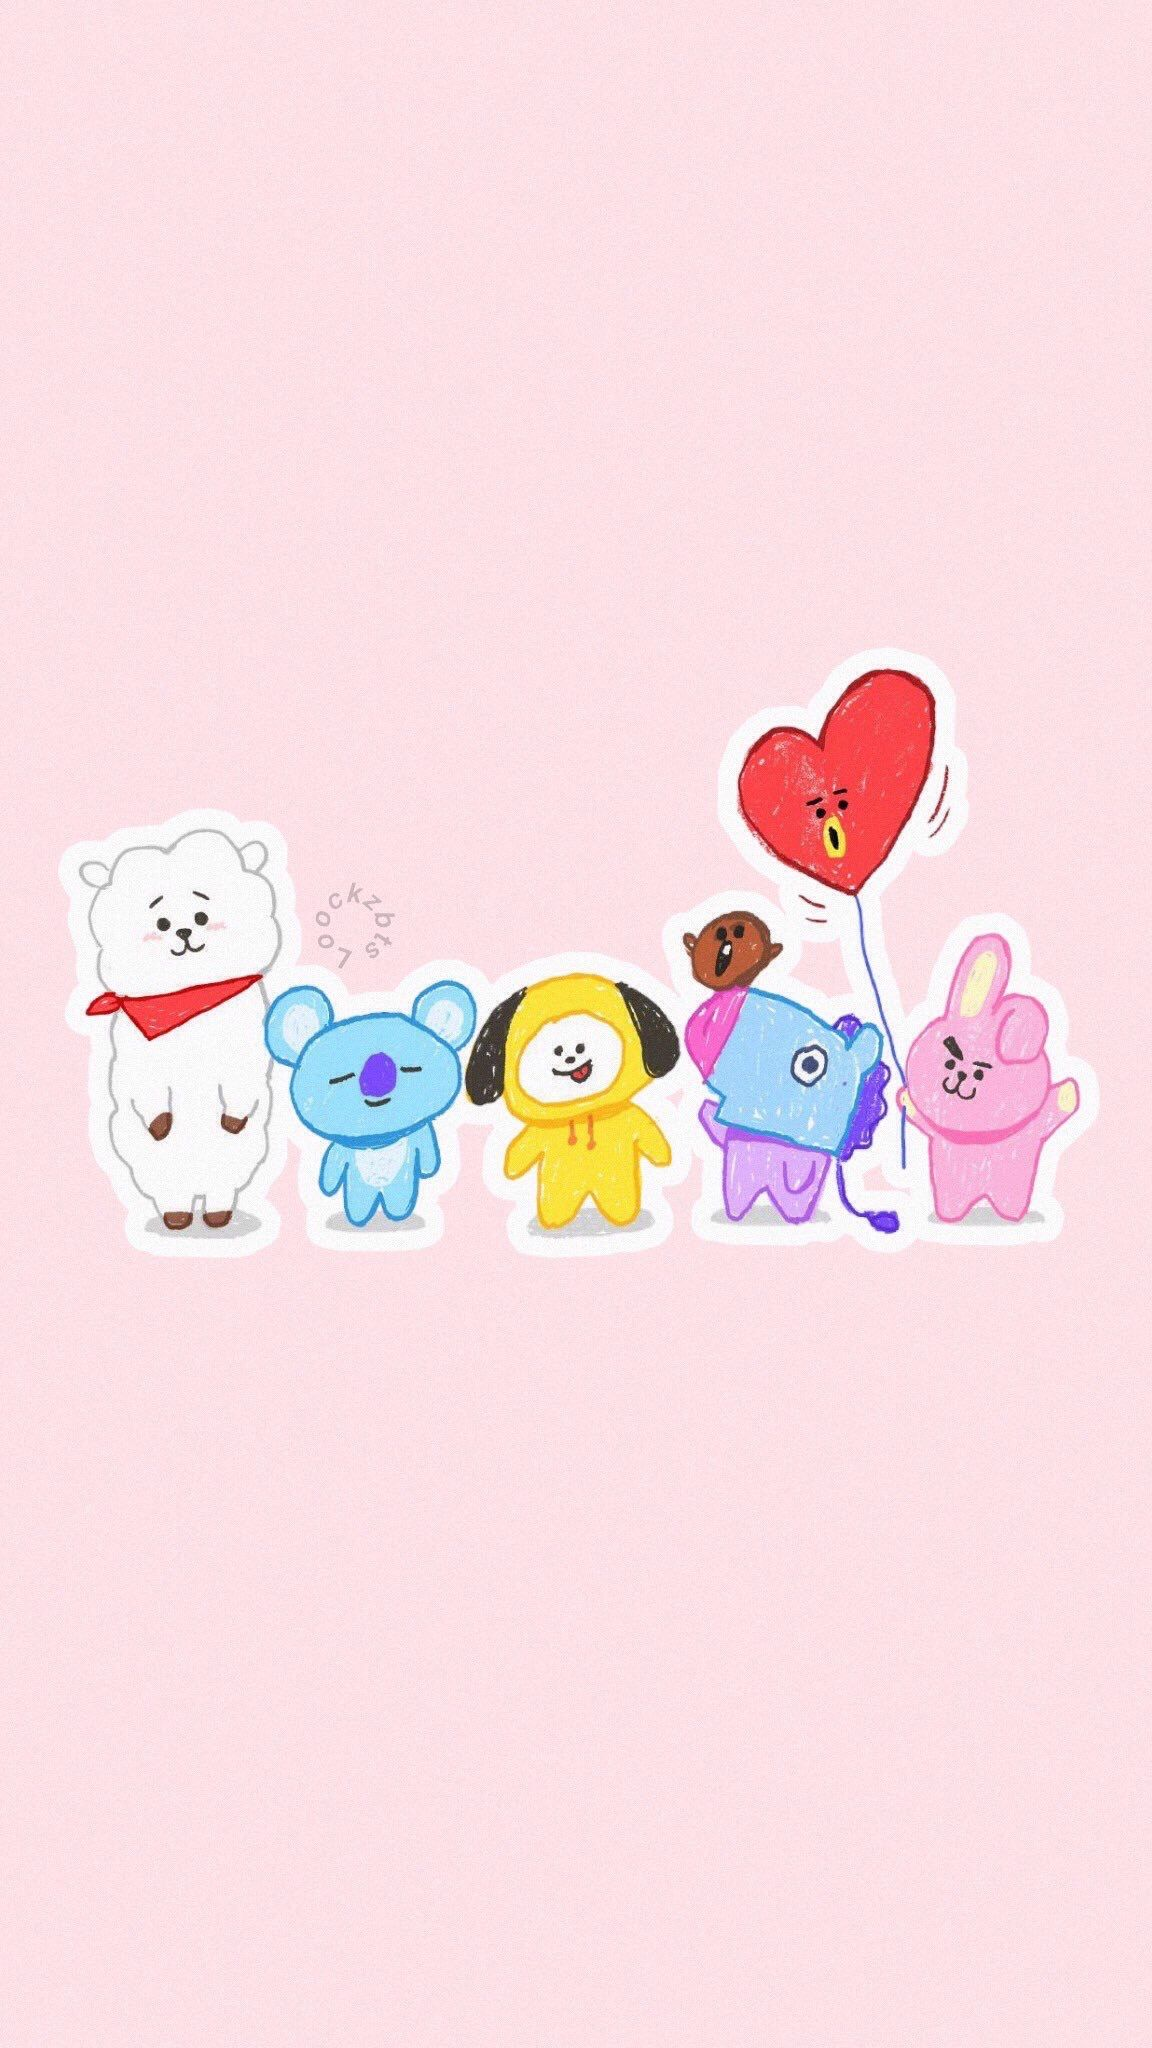 ️ ️ ️ bts bt21 BTS love Pinterest BTS, Wallpaper